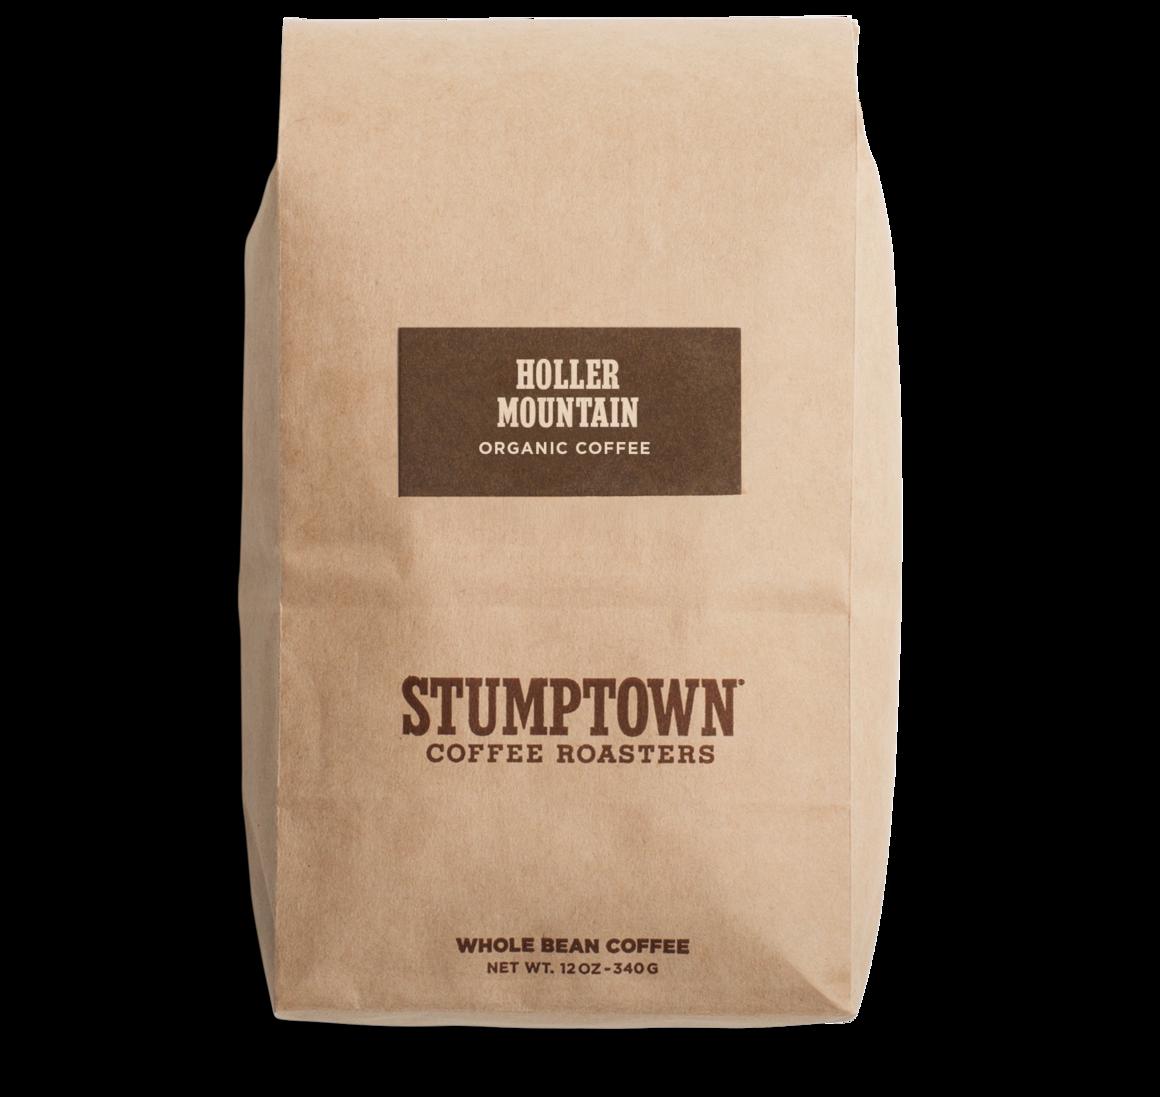 Coffee Roasted Daily Stumptown Coffee Roasters Coffee Stumptown Coffee Roasters Coffee Roasting